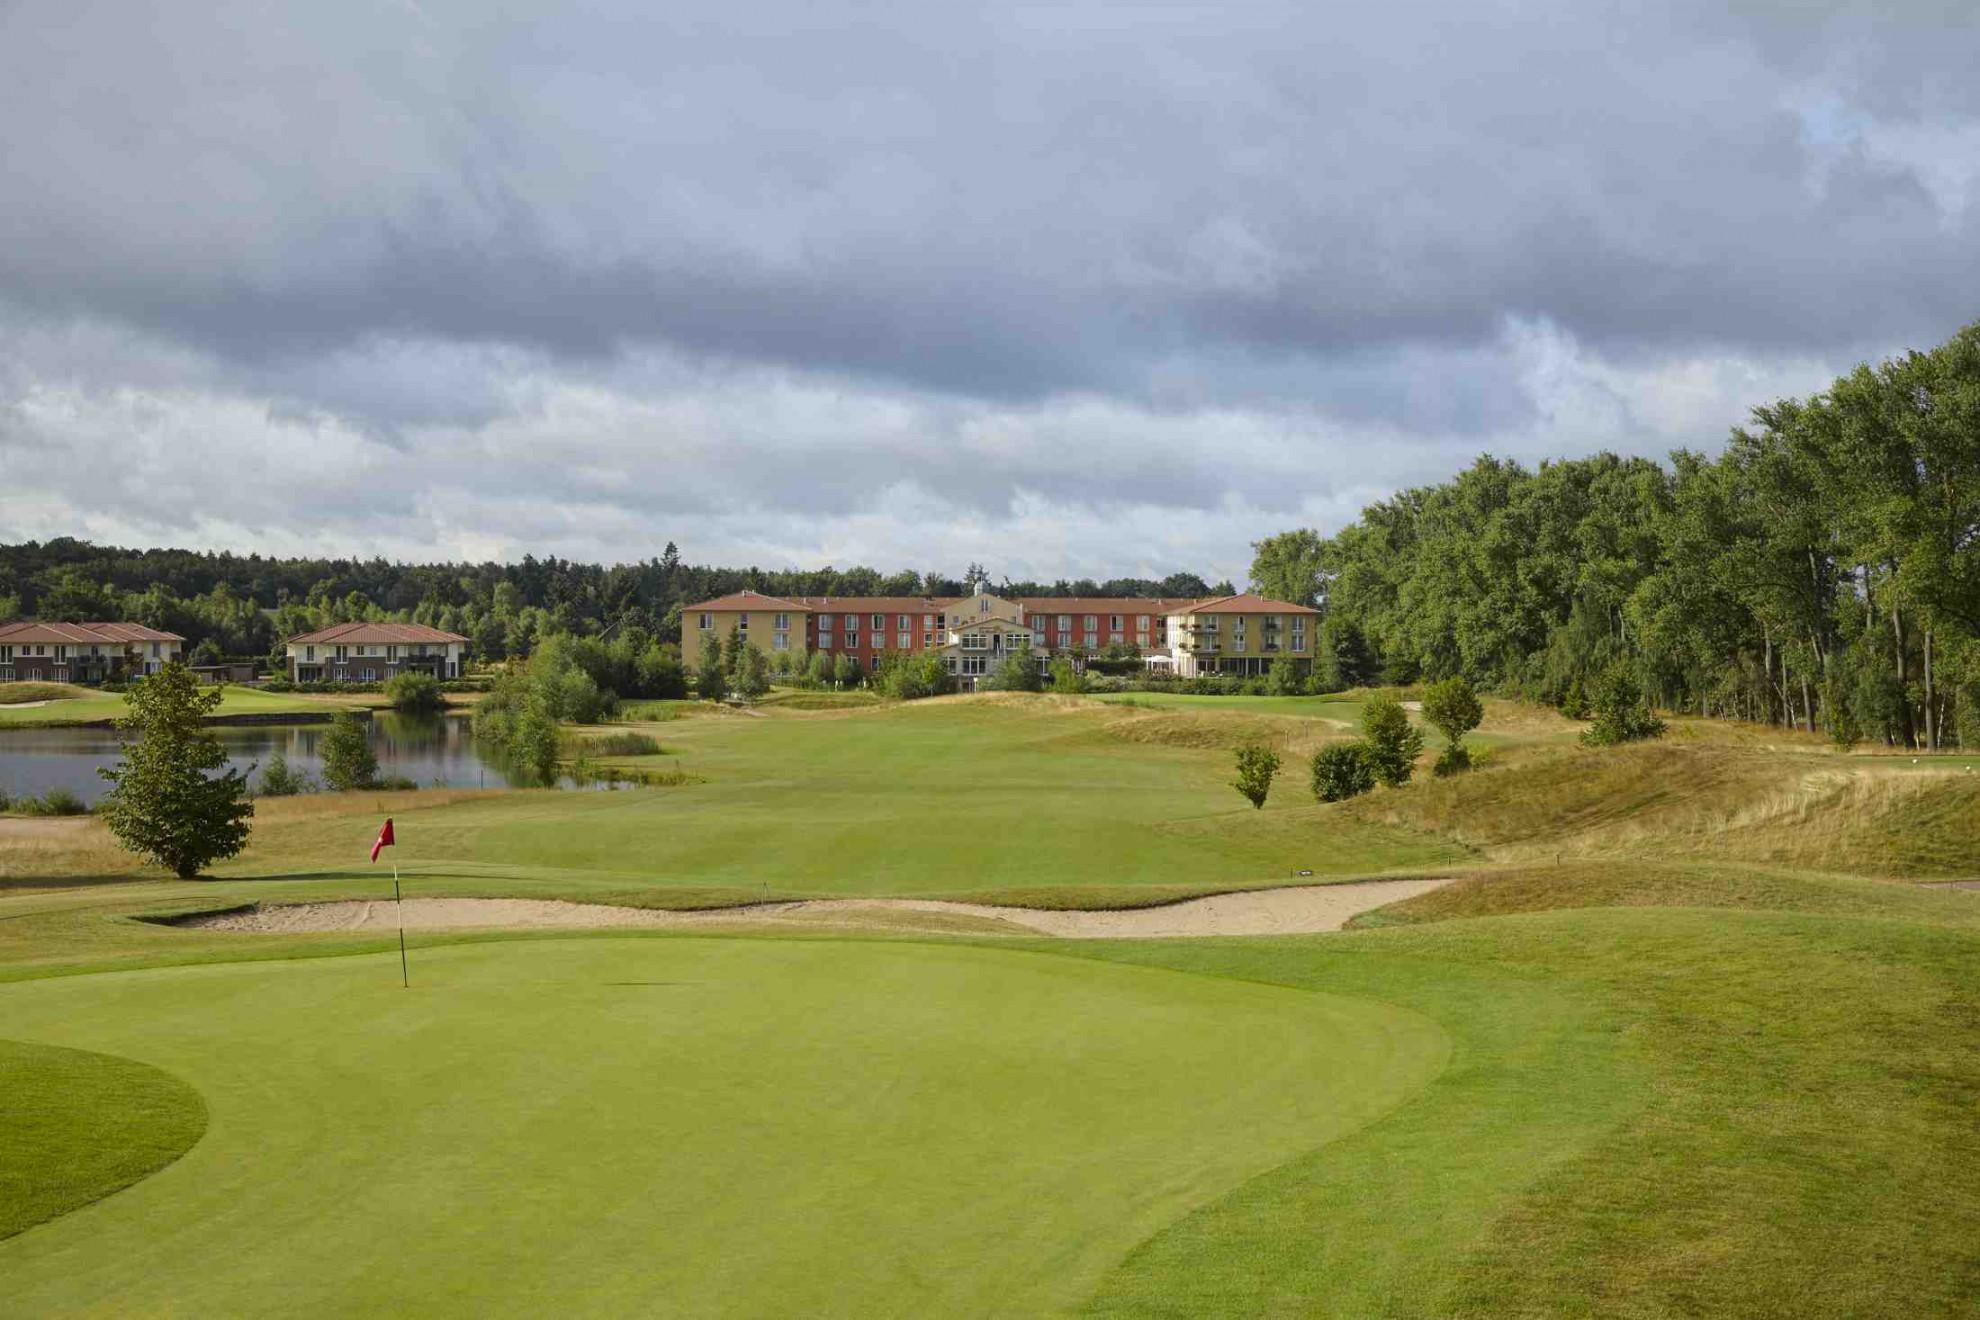 Overview of golf course named Castanea Resort Adendorf